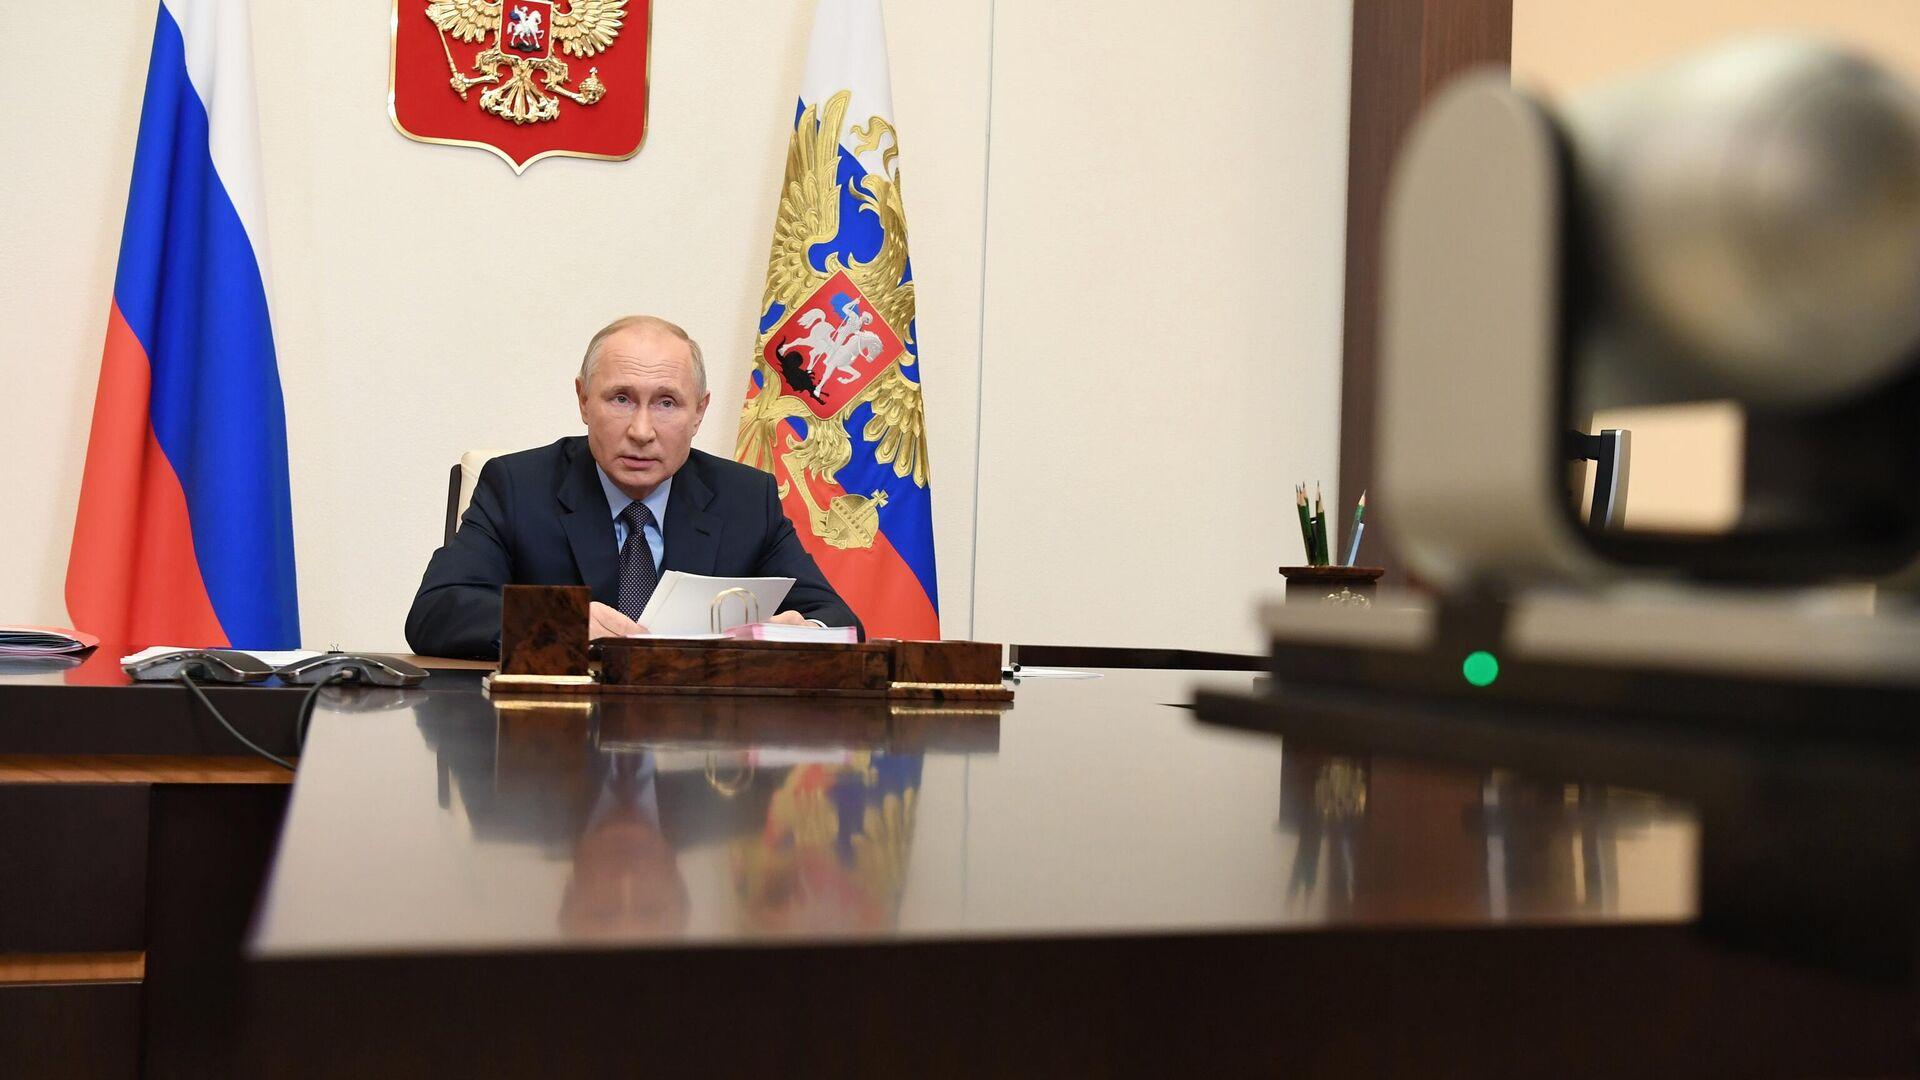 Президент РФ Владимир Путин  - РИА Новости, 1920, 17.11.2020